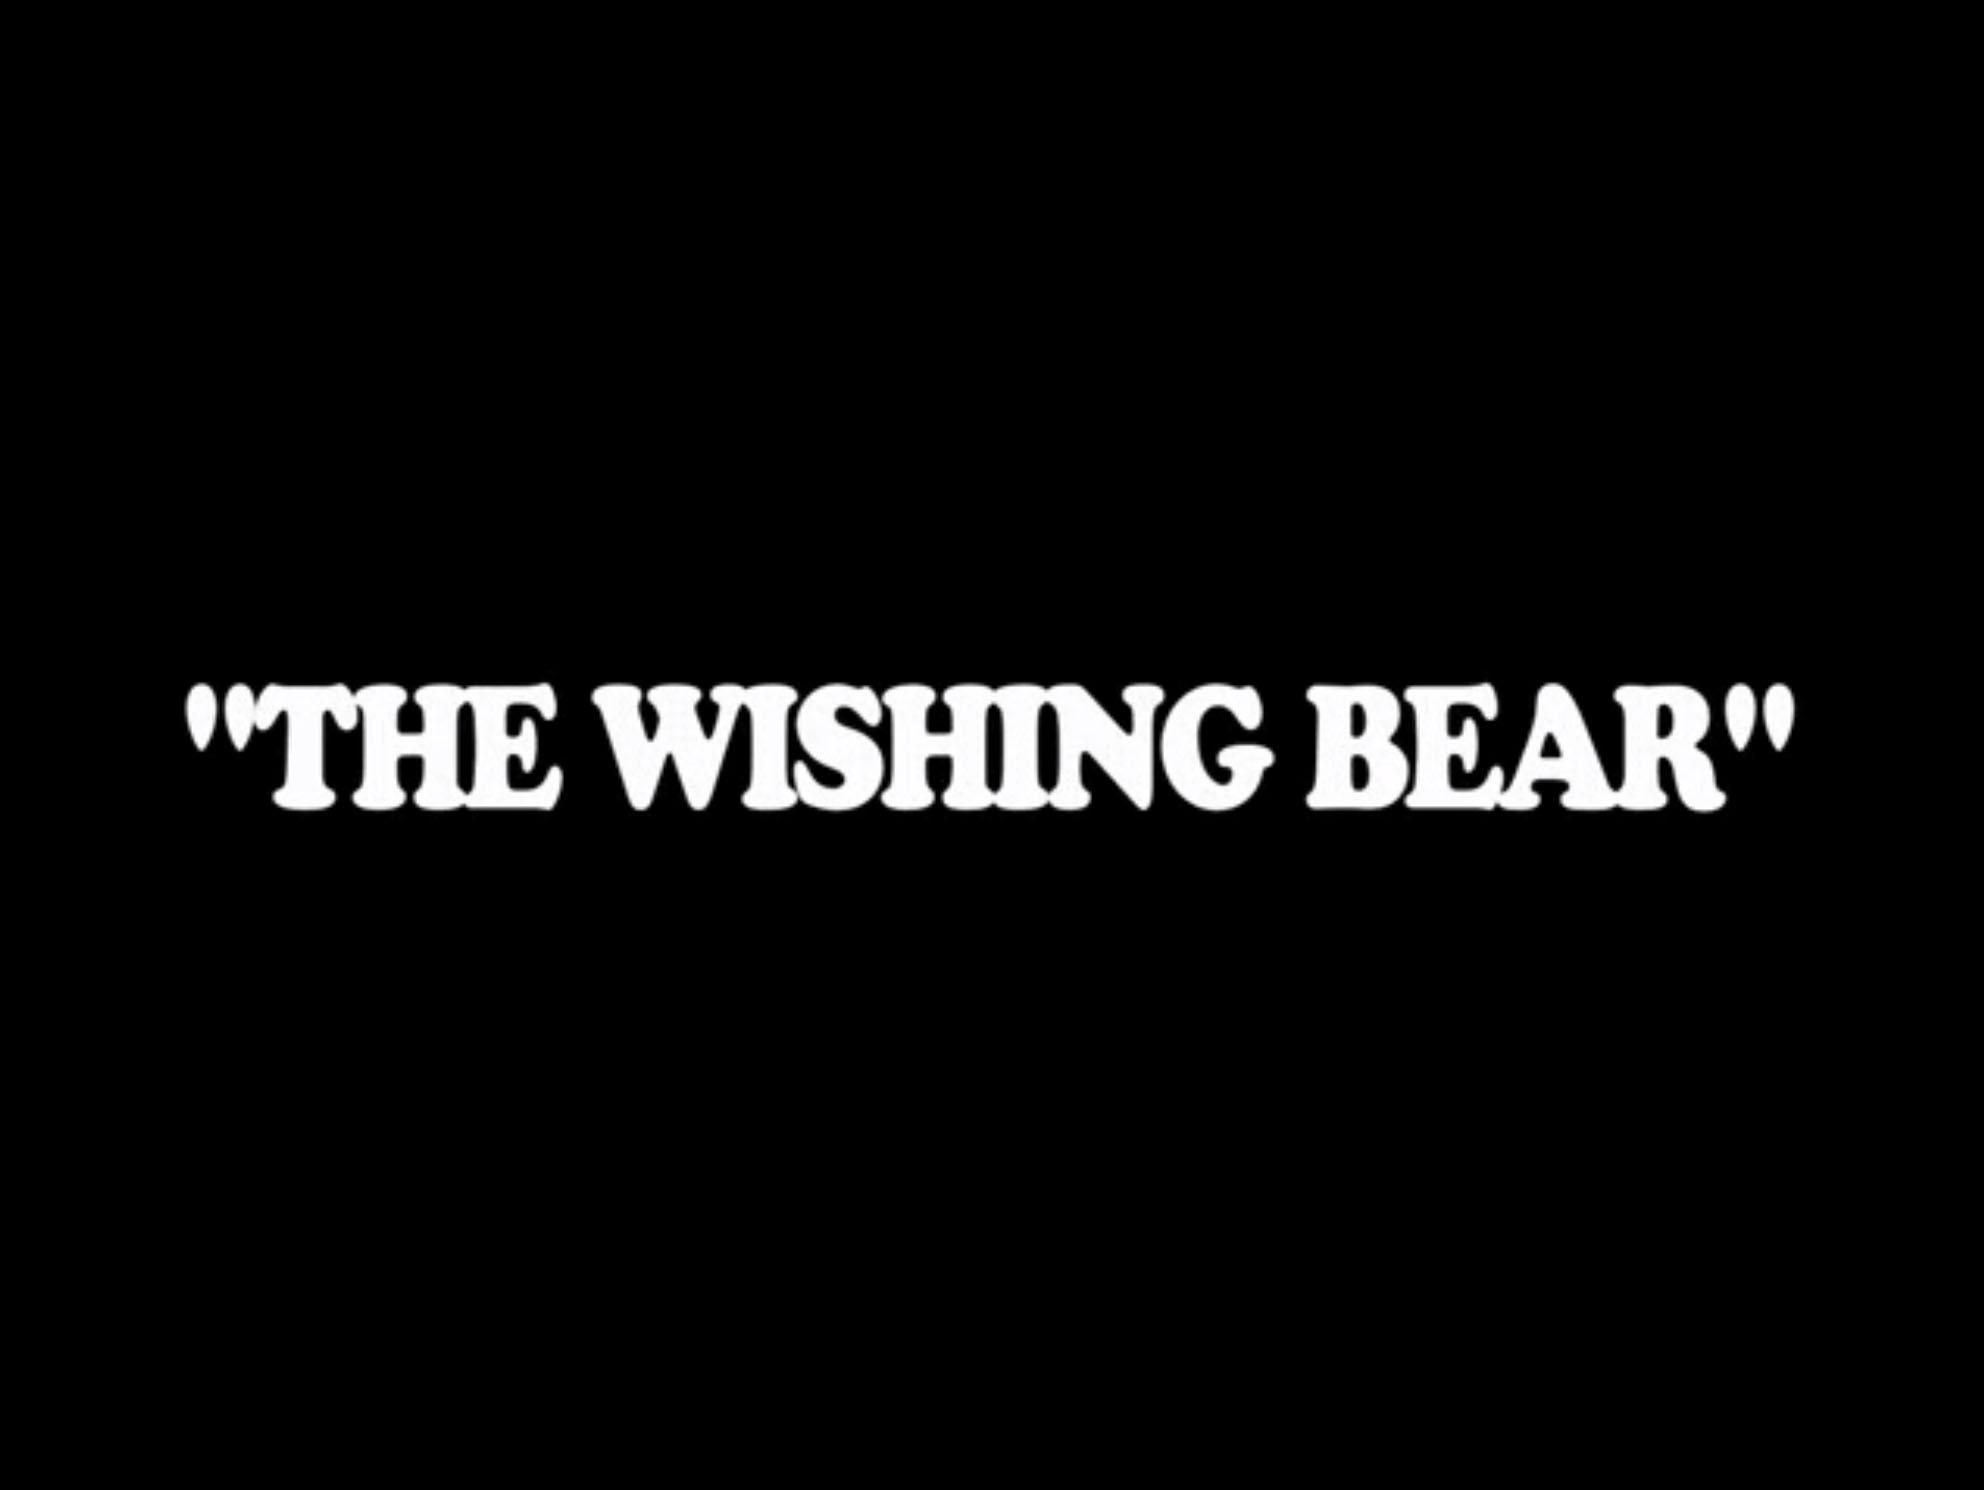 File:The Wishing Bear.jpg